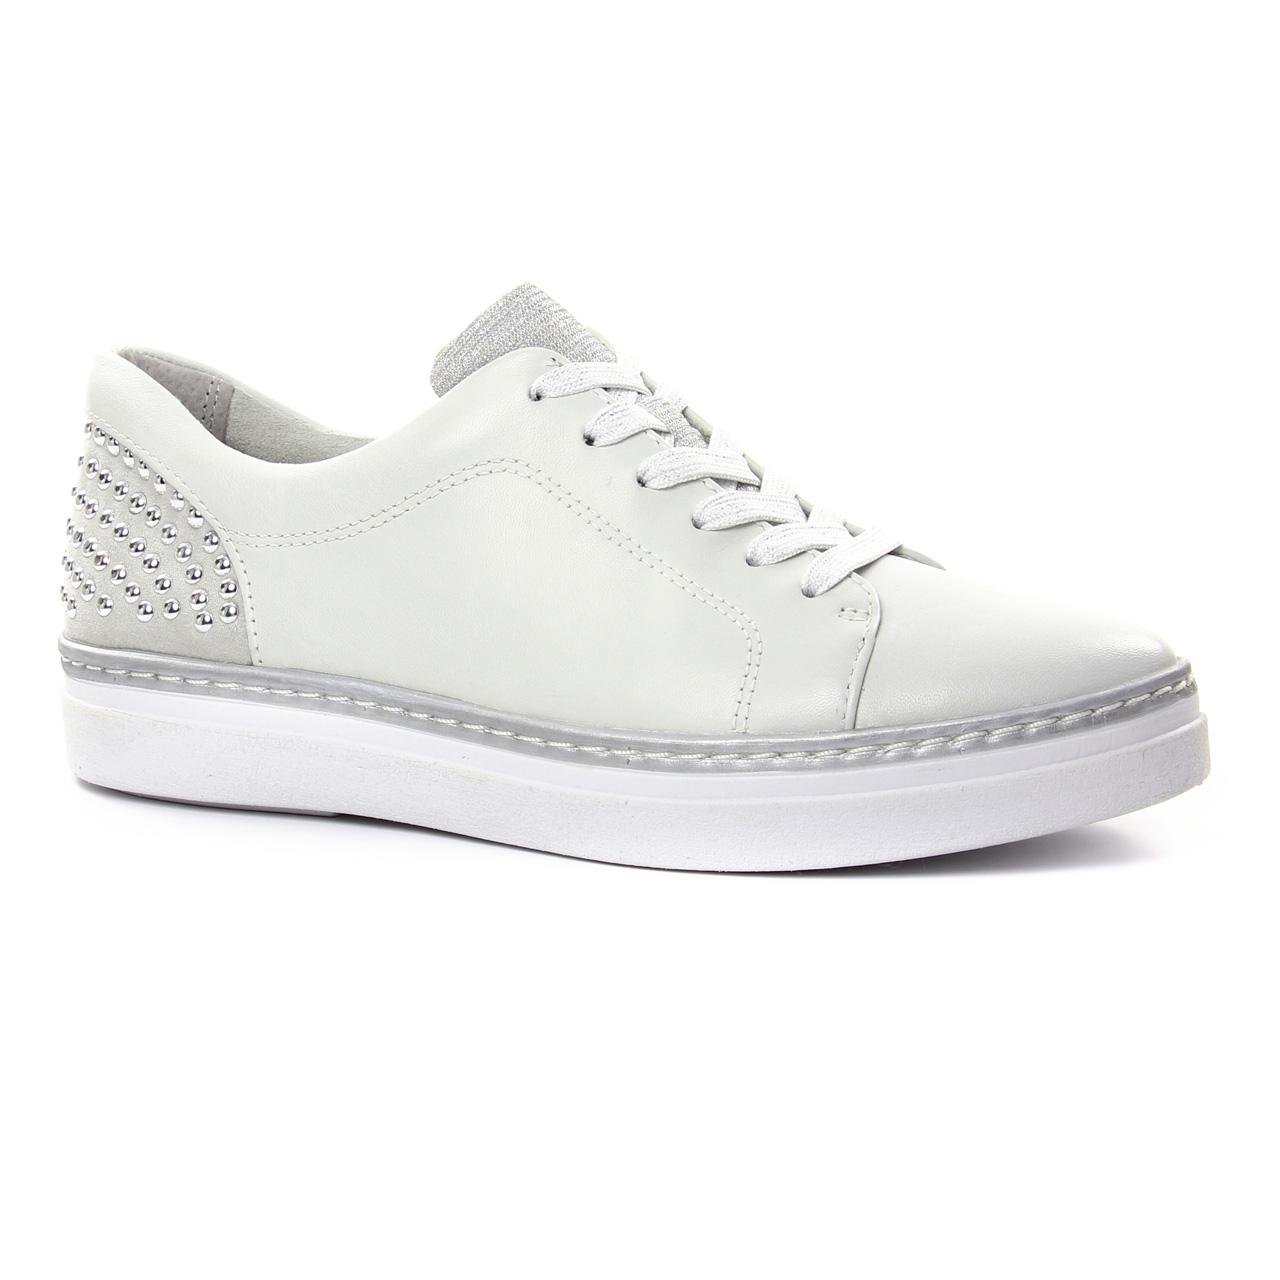 23743, Sneakers Basses Femme, Blanc (White), 40 EUTamaris